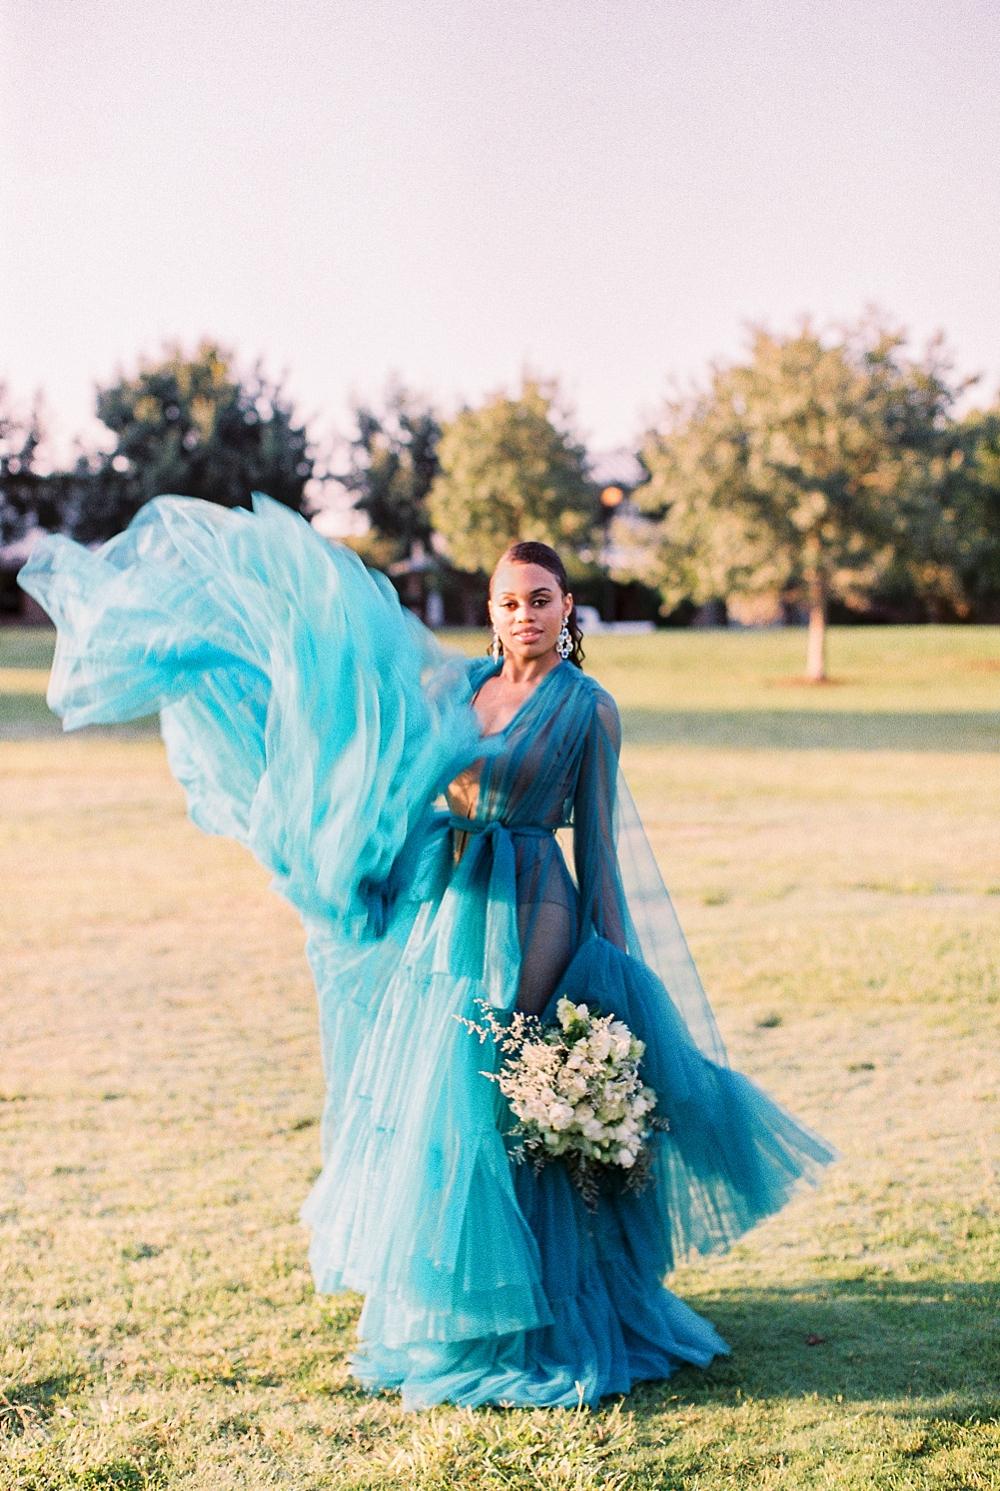 kristin-la-voie-photography-AUSTIN-wedding-BOUDOIR-photographer-67